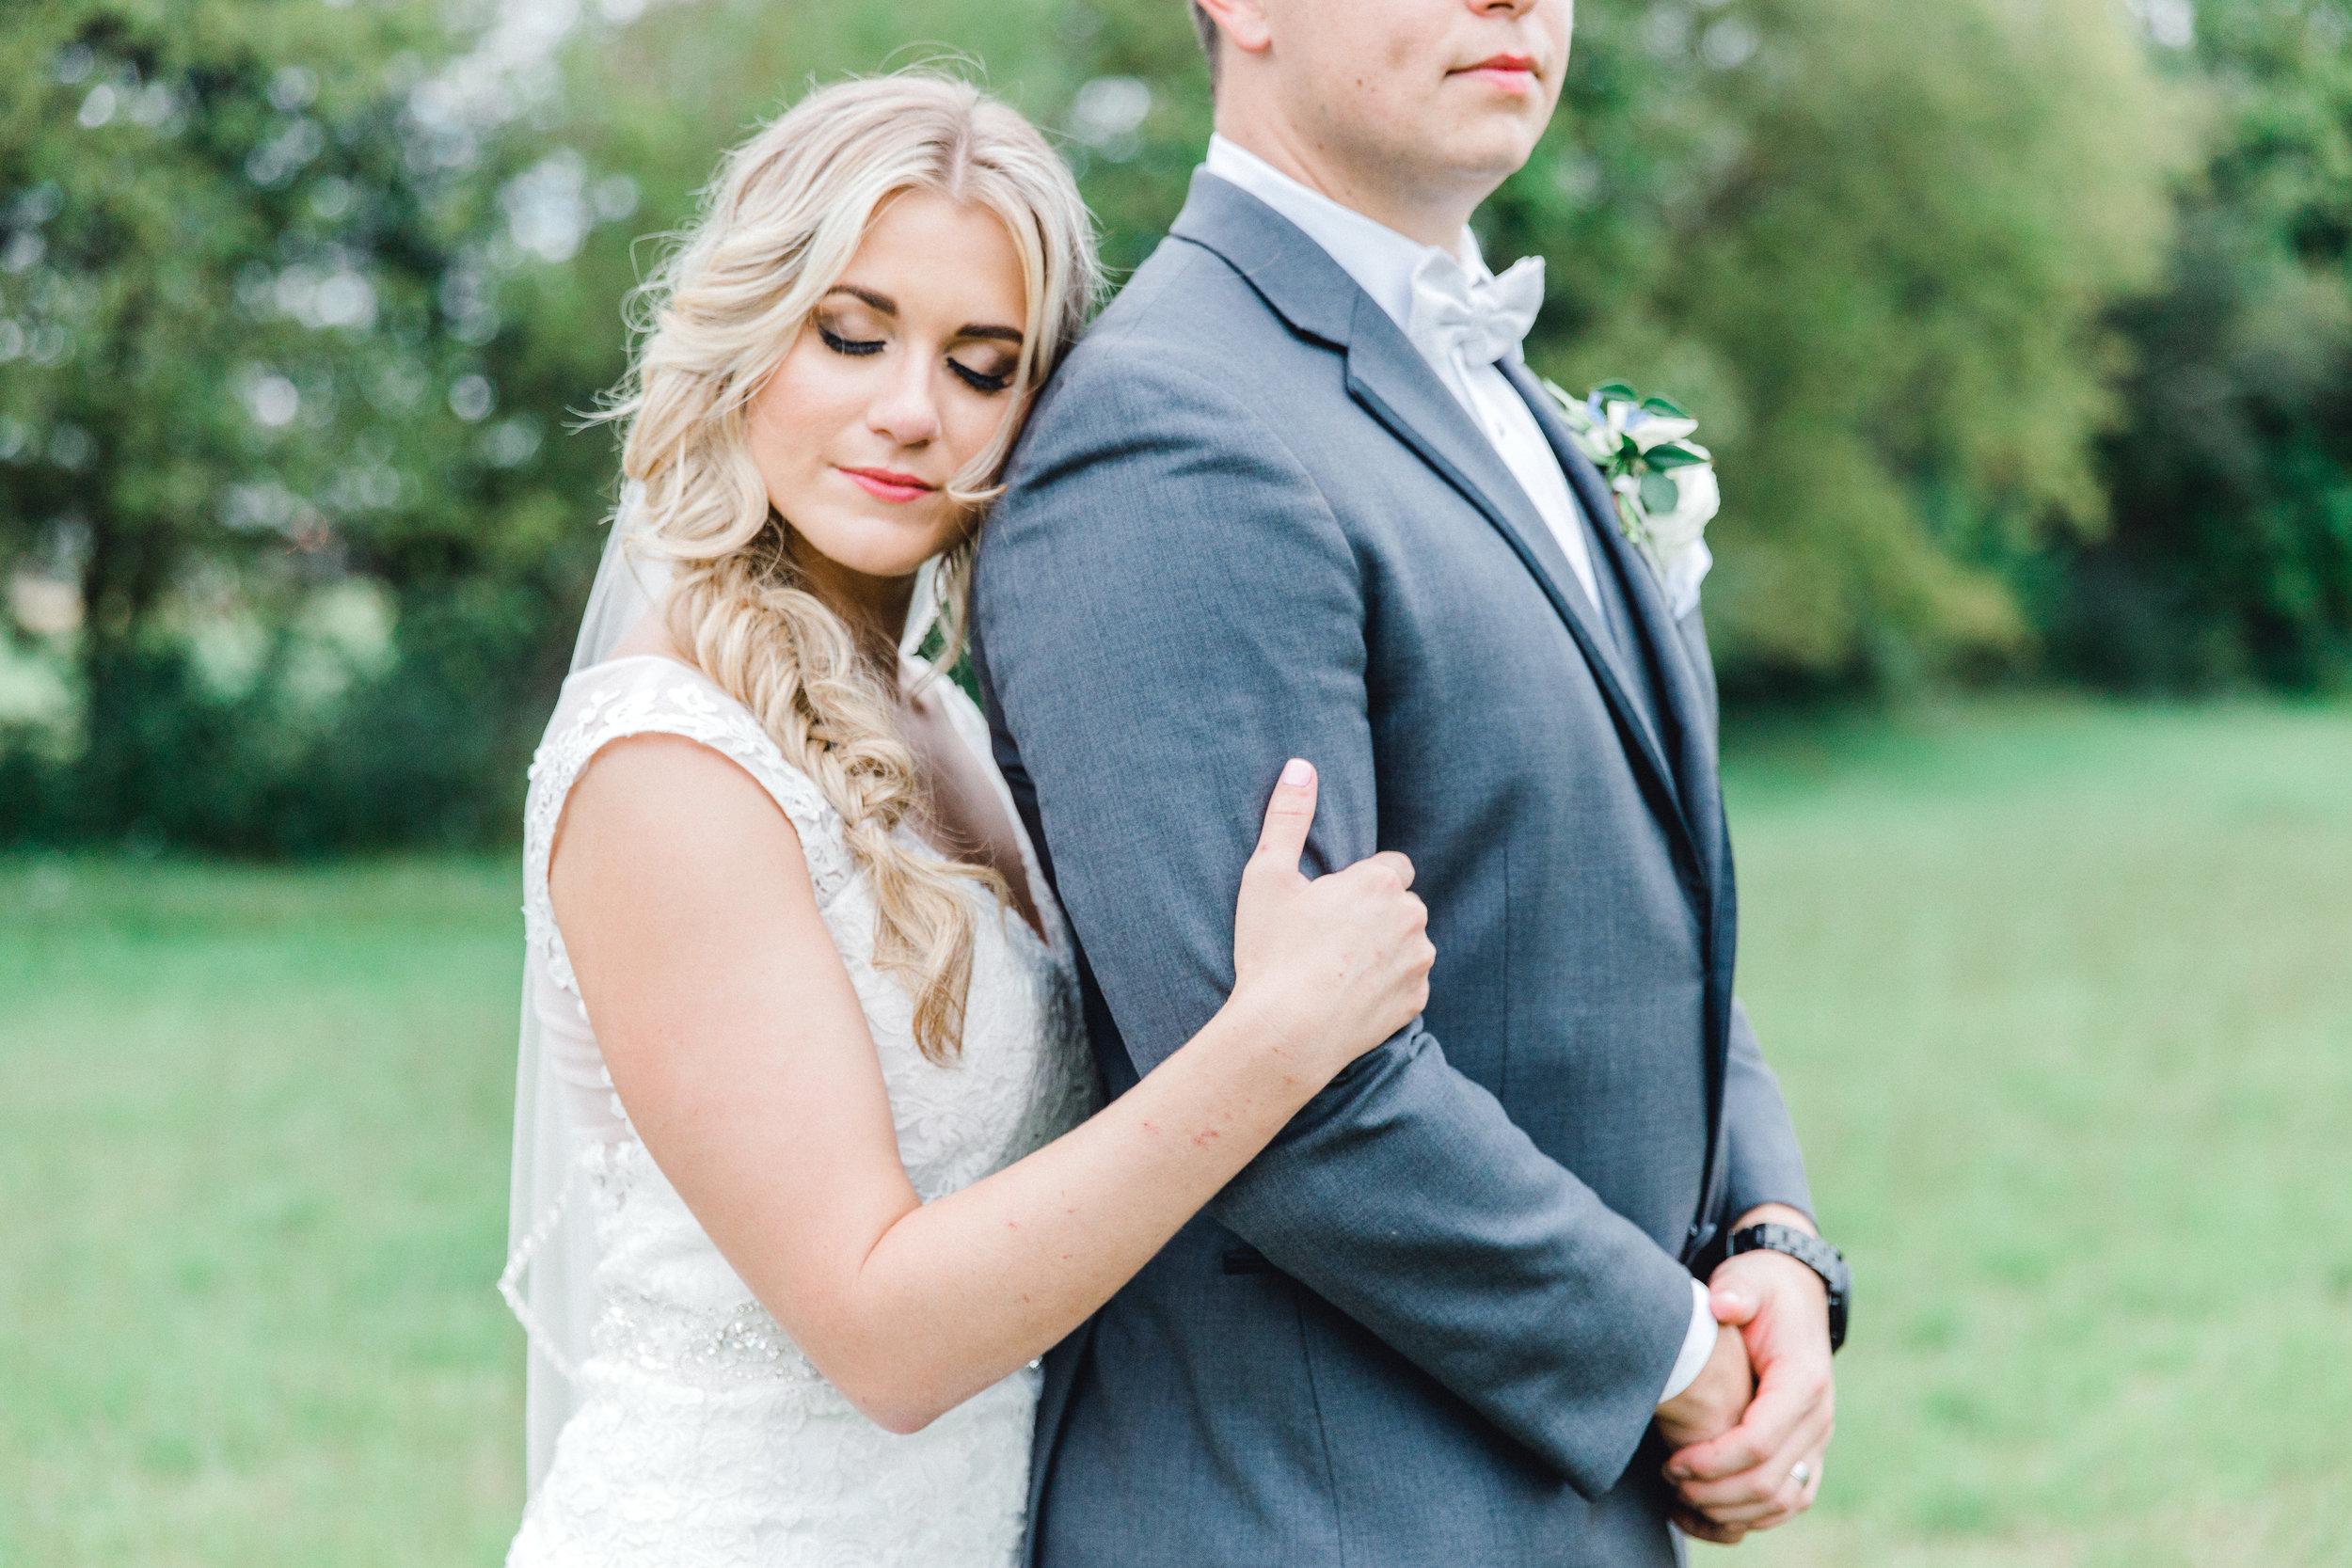 Paige-Mercer-Photography-Florida-Wedding-Photographer-Alyssa&Drew-68.jpg